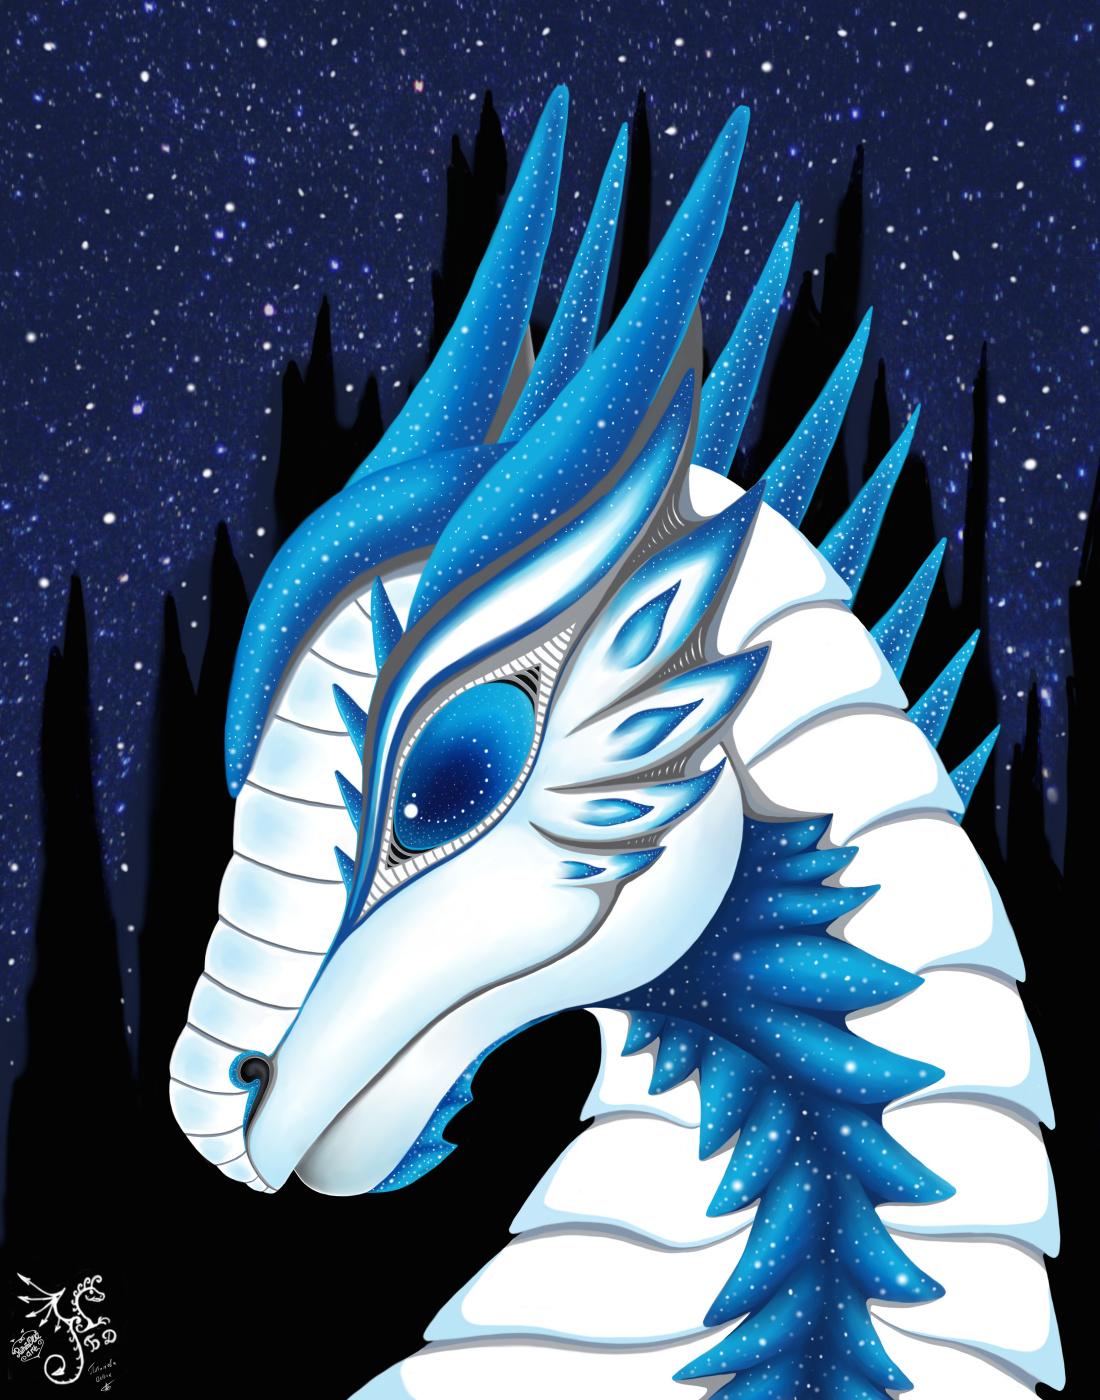 Olga Vasilievna Potapova. Dragonwoman - White Starry Night